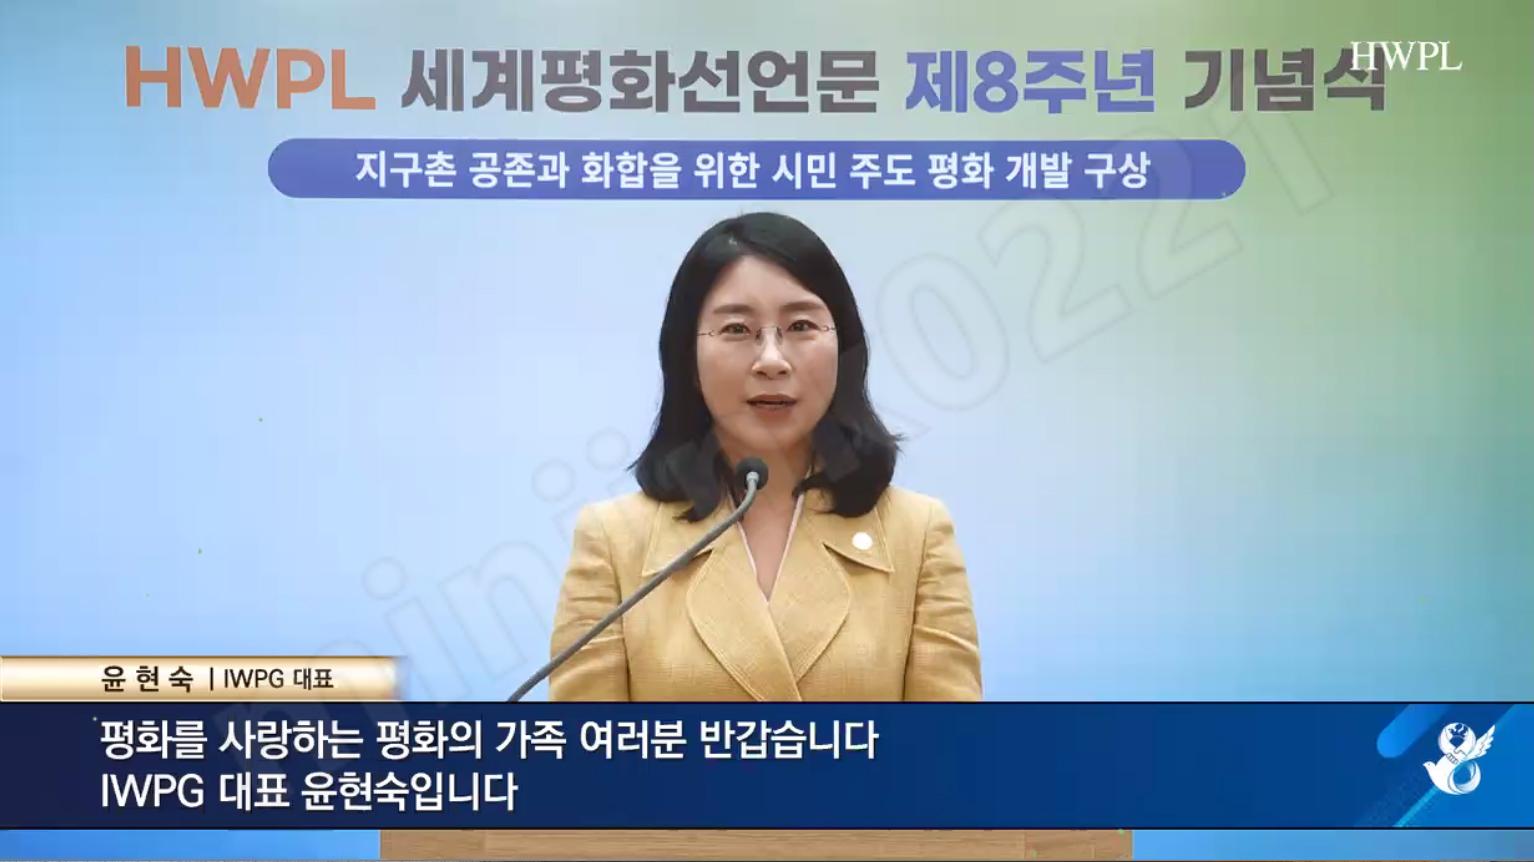 2)_Chairwoman_Hyun_Sook_Yoon_giving_her_remarks_.jpg